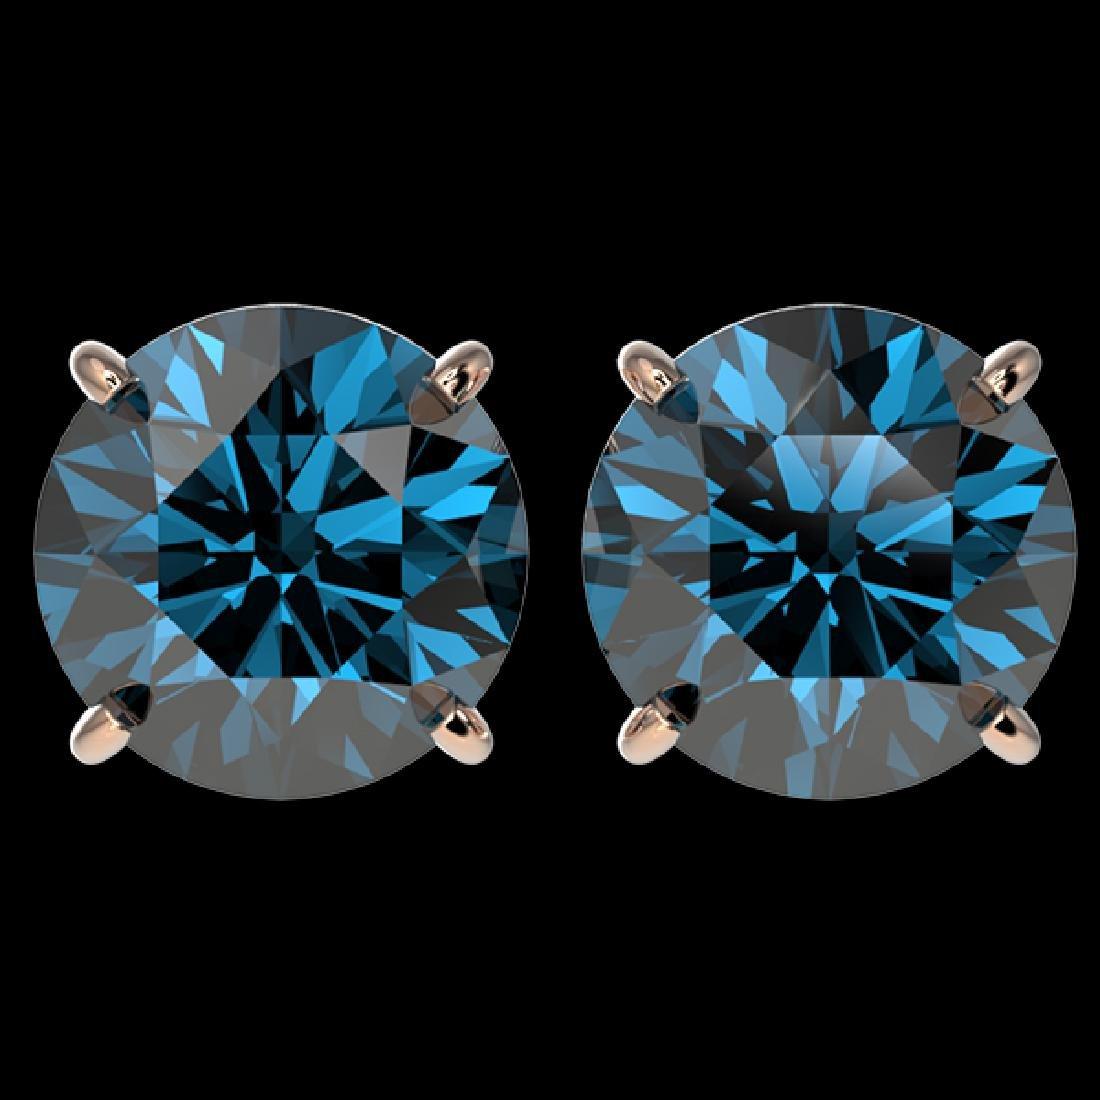 4 CTW Certified Intense Blue SI Diamond Solitaire Stud